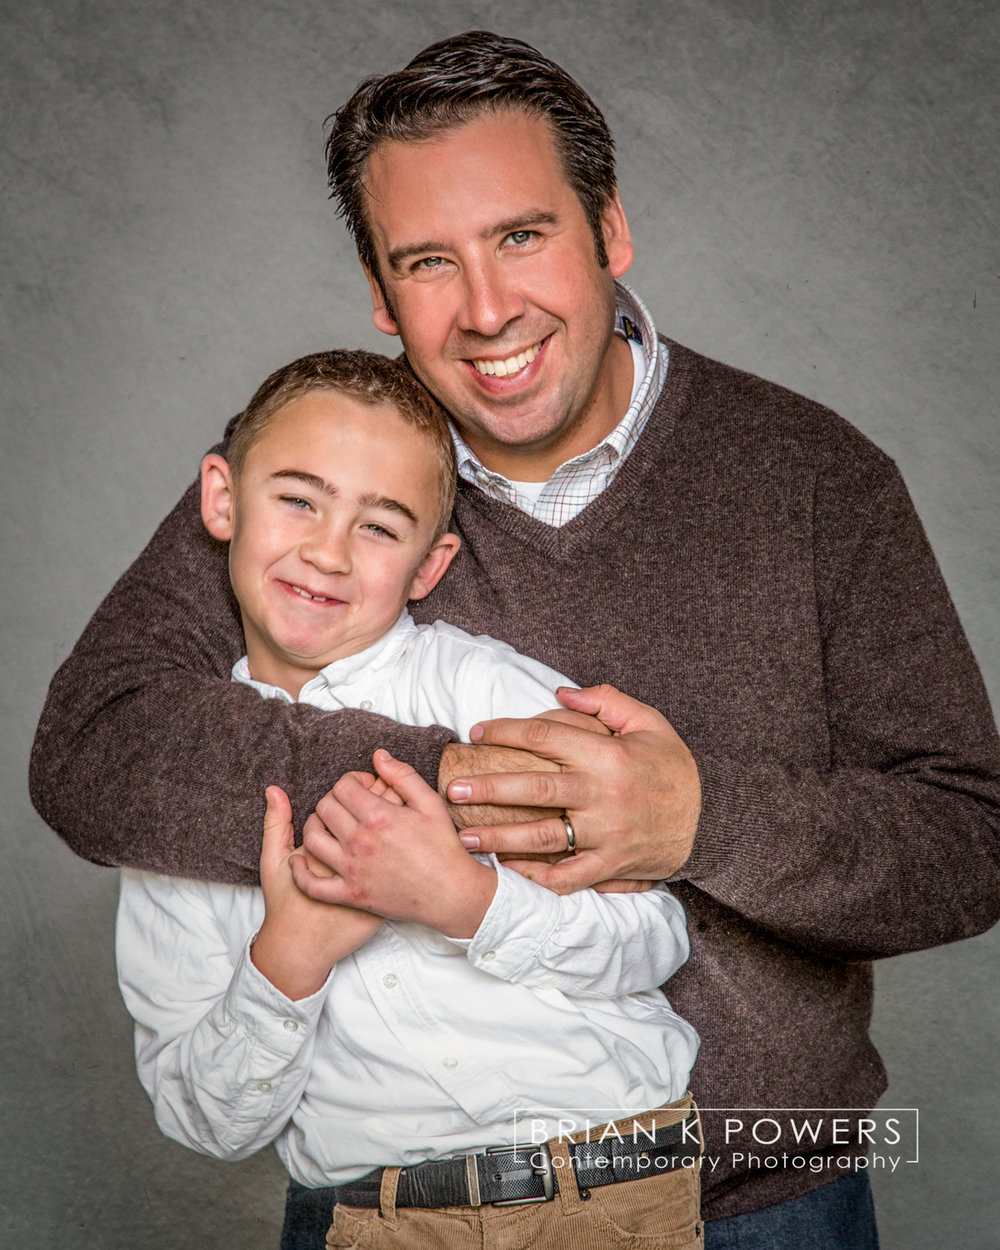 Portrait-Website McBride-Family_portrait_with_children-012.jpg